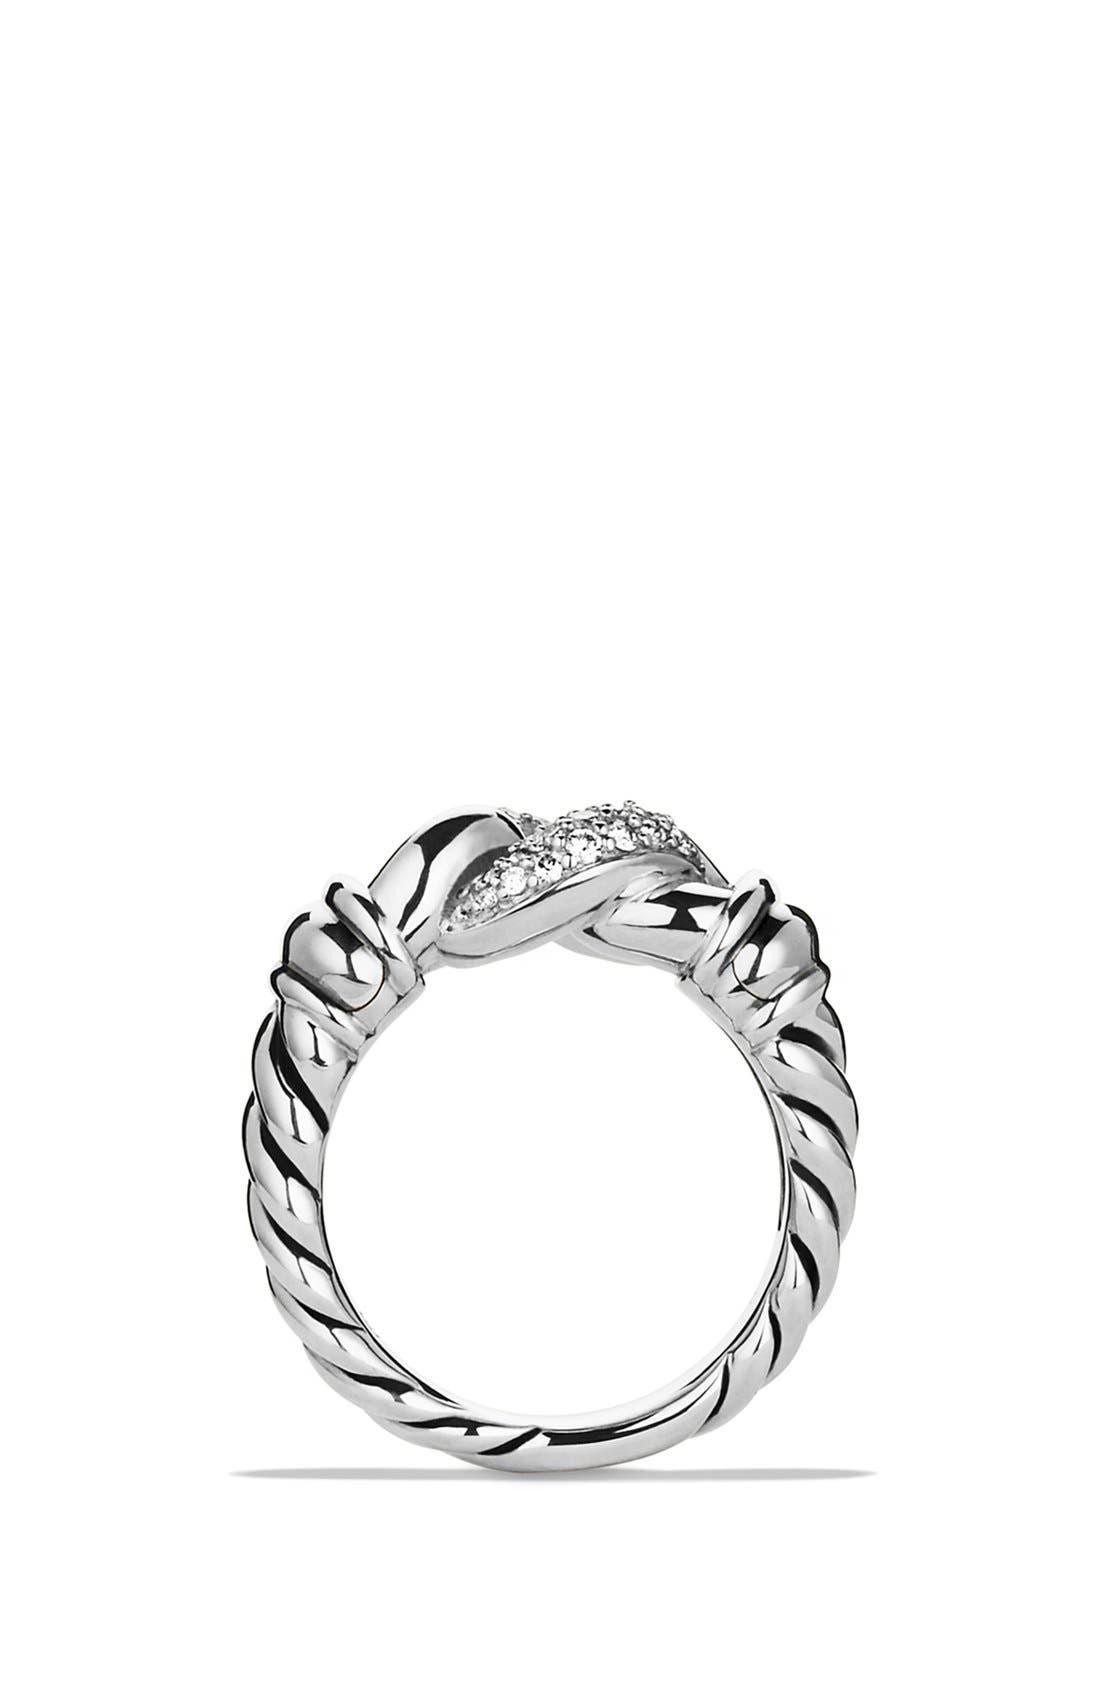 Alternate Image 2  - David Yurman 'Metro' Curb Wide Ring with Diamonds